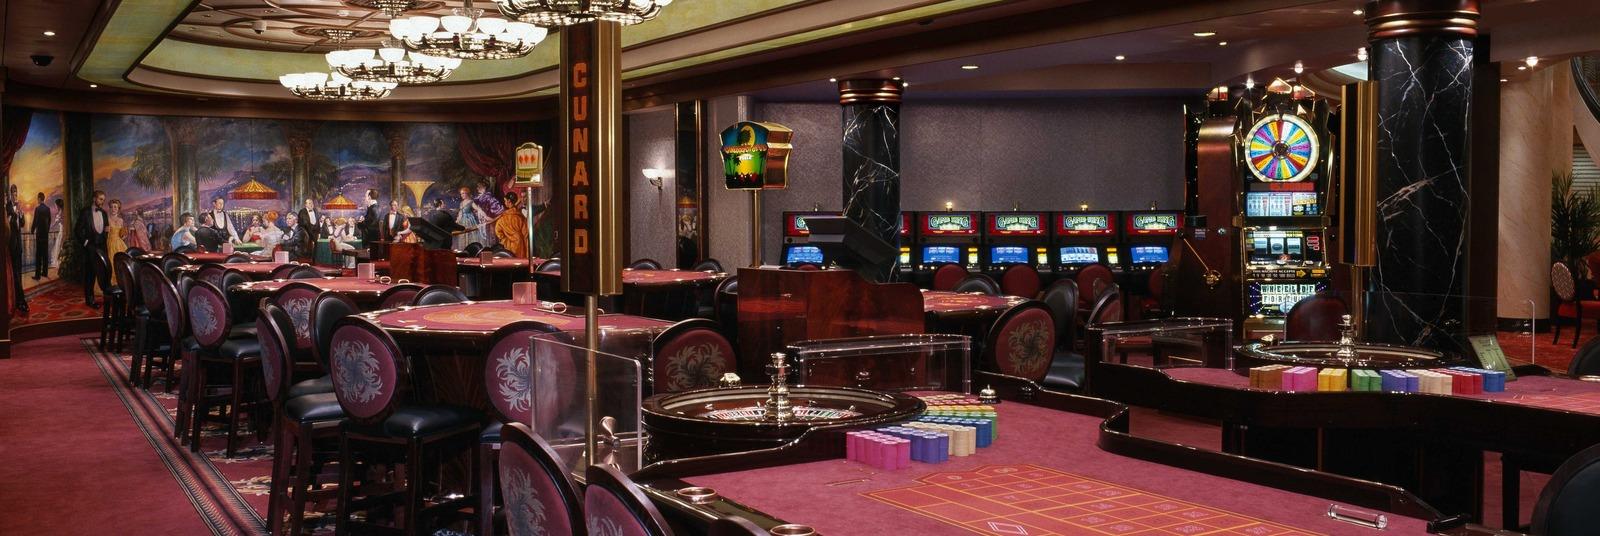 Homepage_large_qm2_empre_casino_2